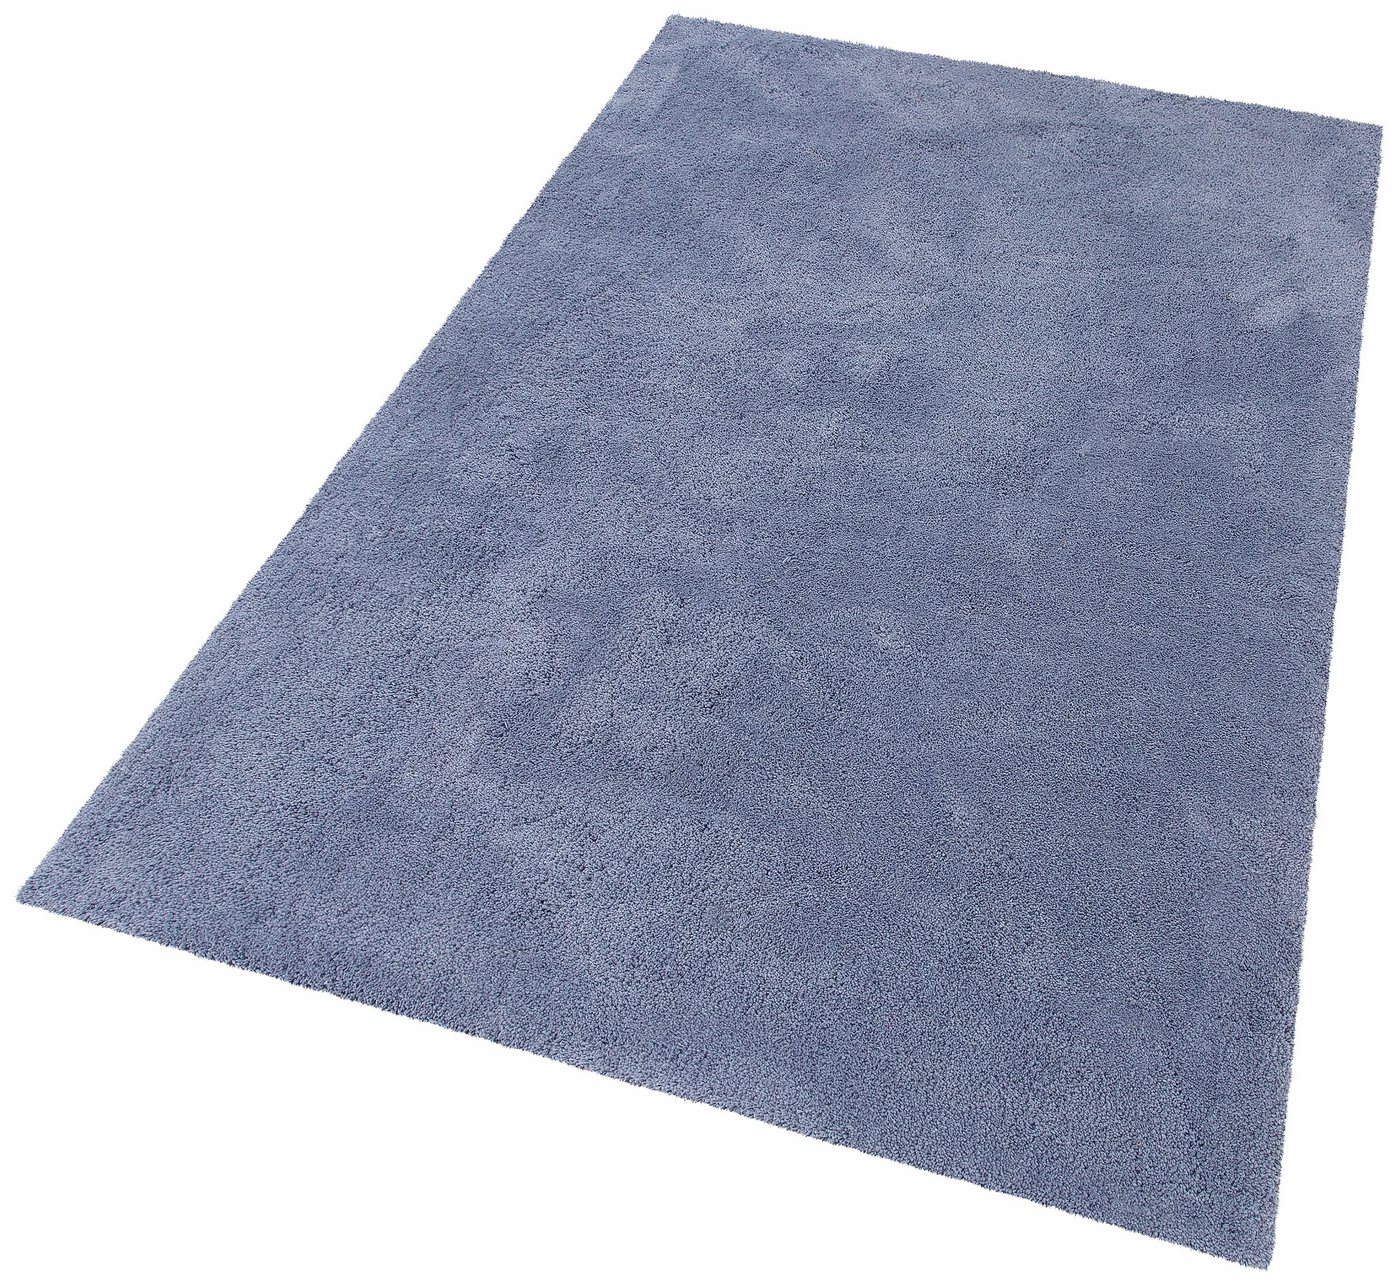 - Hoogpolig vloerkleed, MY HOME SELECTION, Desner, hoogte 38 mm, handgetuft